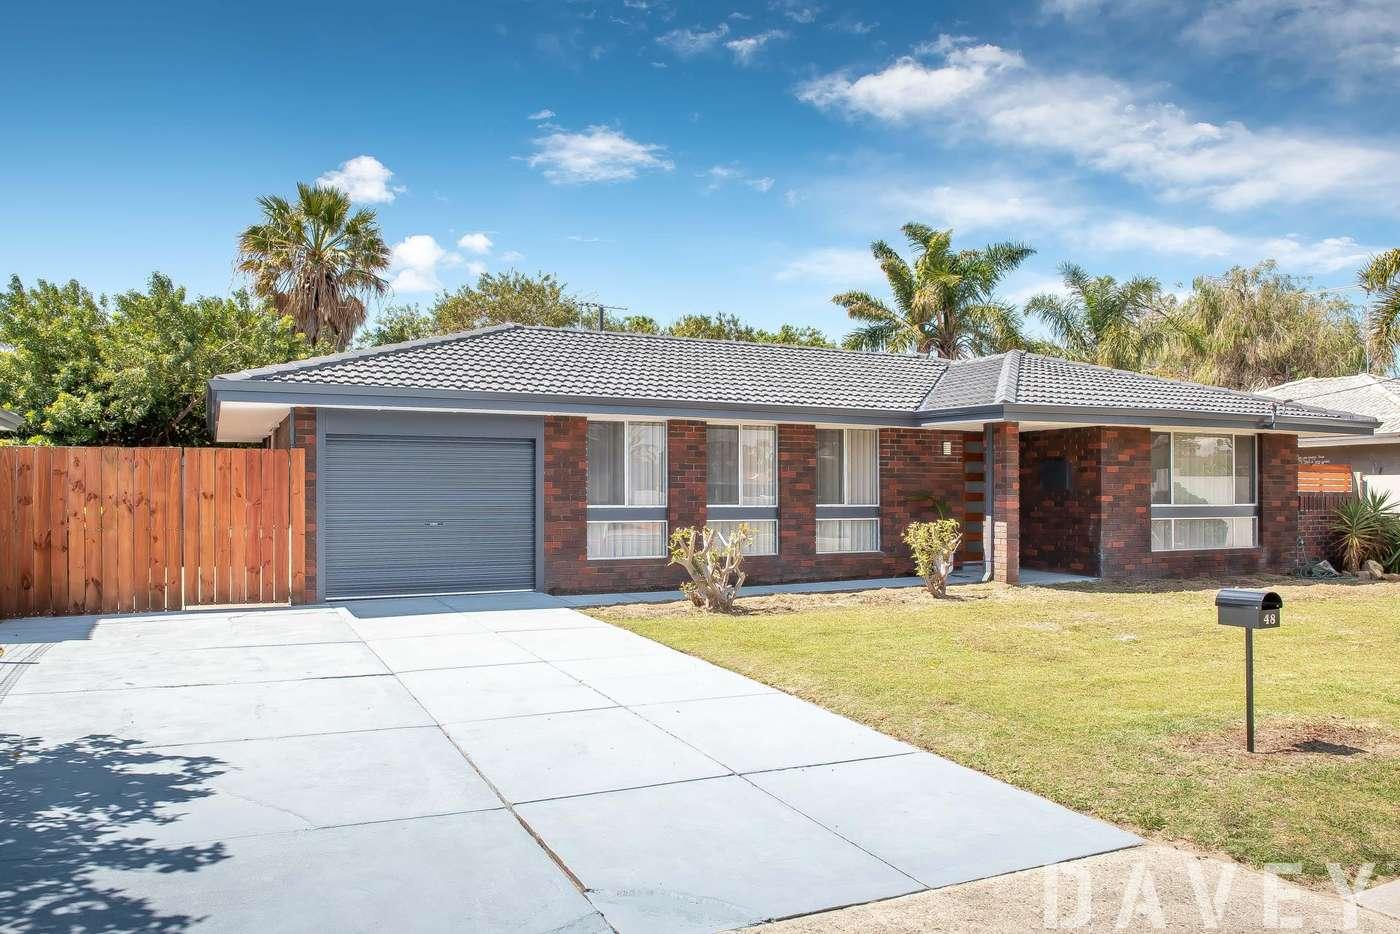 Main view of Homely house listing, 48 Grey Road, Padbury WA 6025